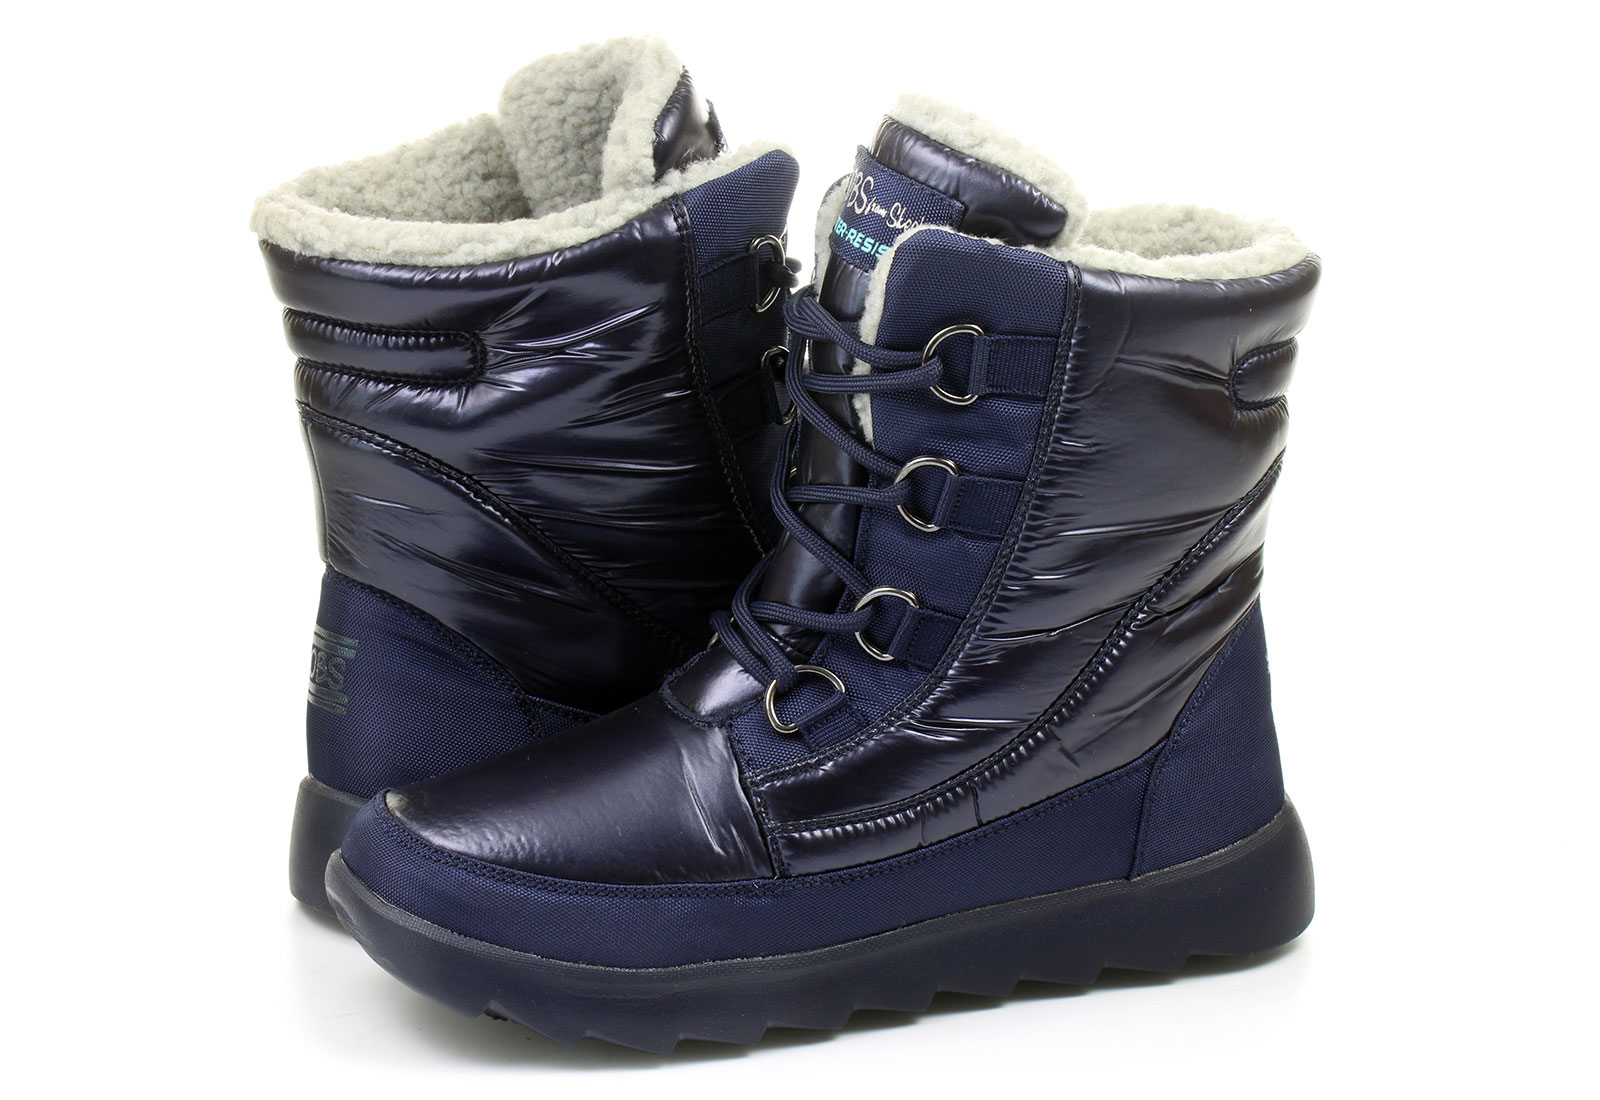 Skechers Boots - Snow Cap - 34355-nvy - Online shop for